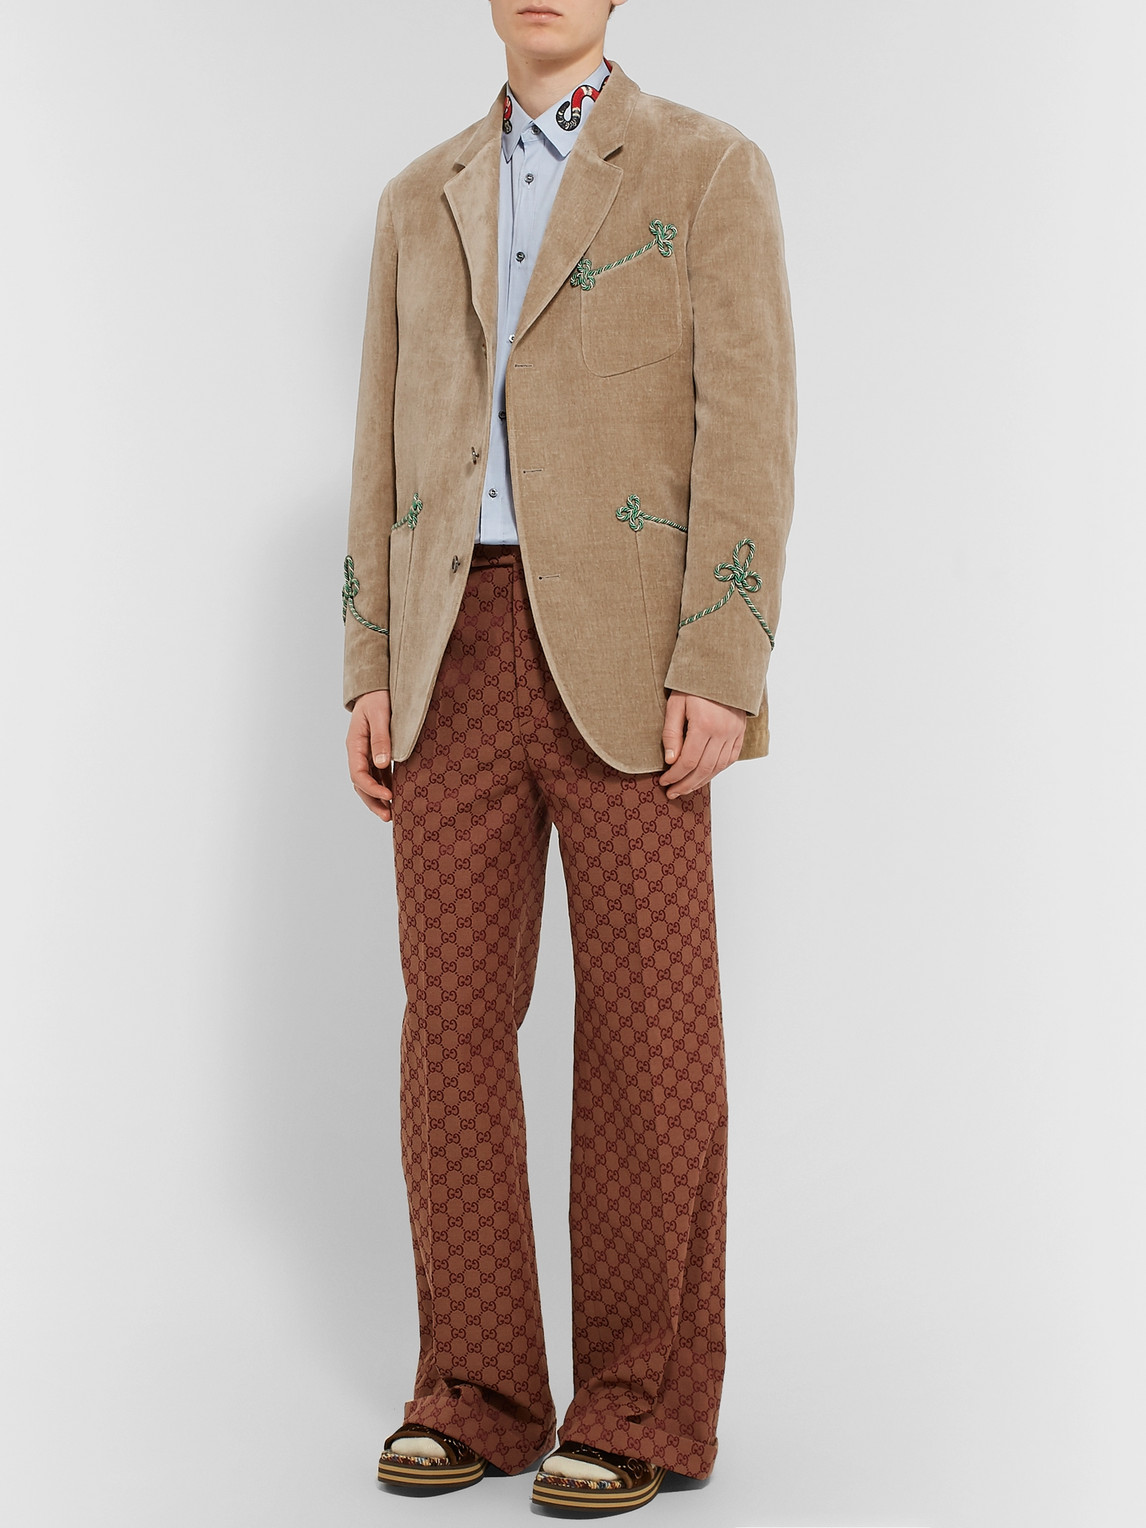 Gucci Jackets BEIGE PASSEMENTERIE-TRIMMED EMBROIDERED COTTON AND LINEN-BLEND VELVET BLAZER